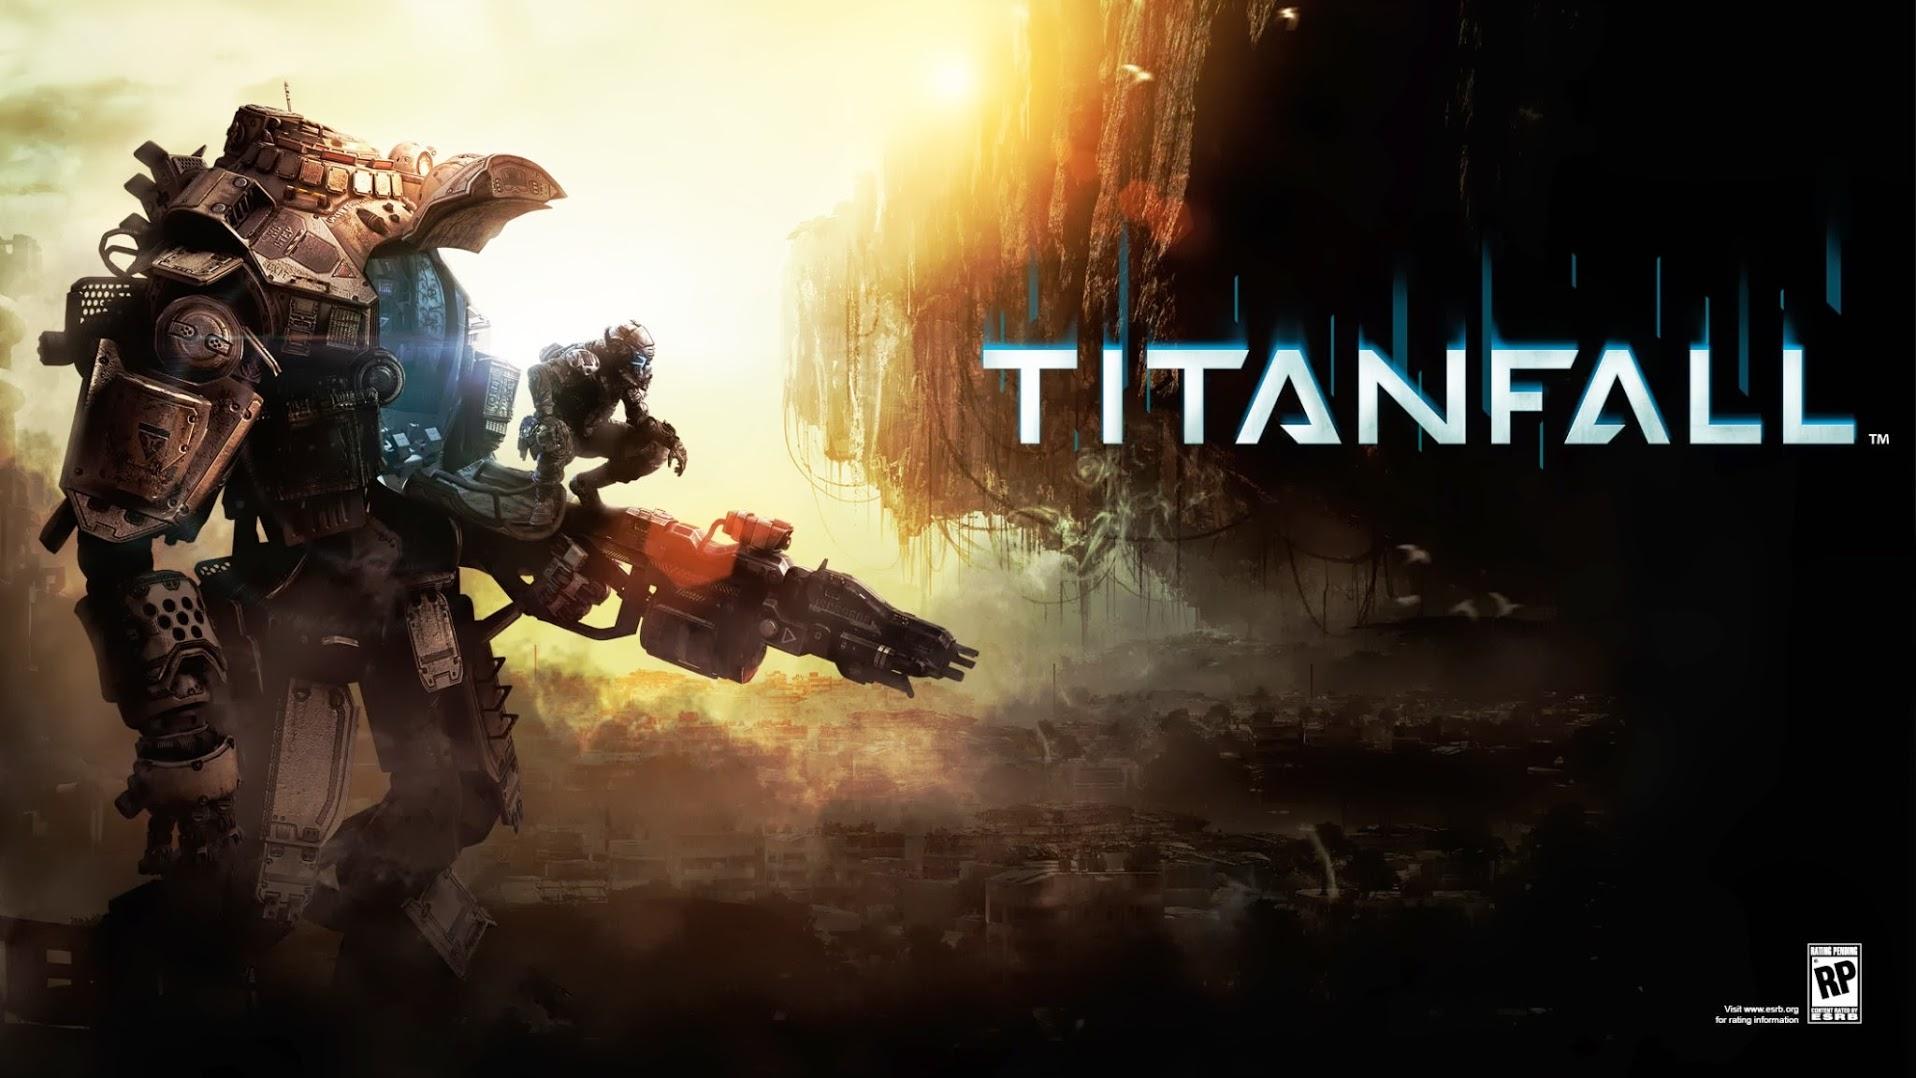 Titanfall Beta для всех владельцев Xbox One сегодня | Для PC завтра! - Изображение 1